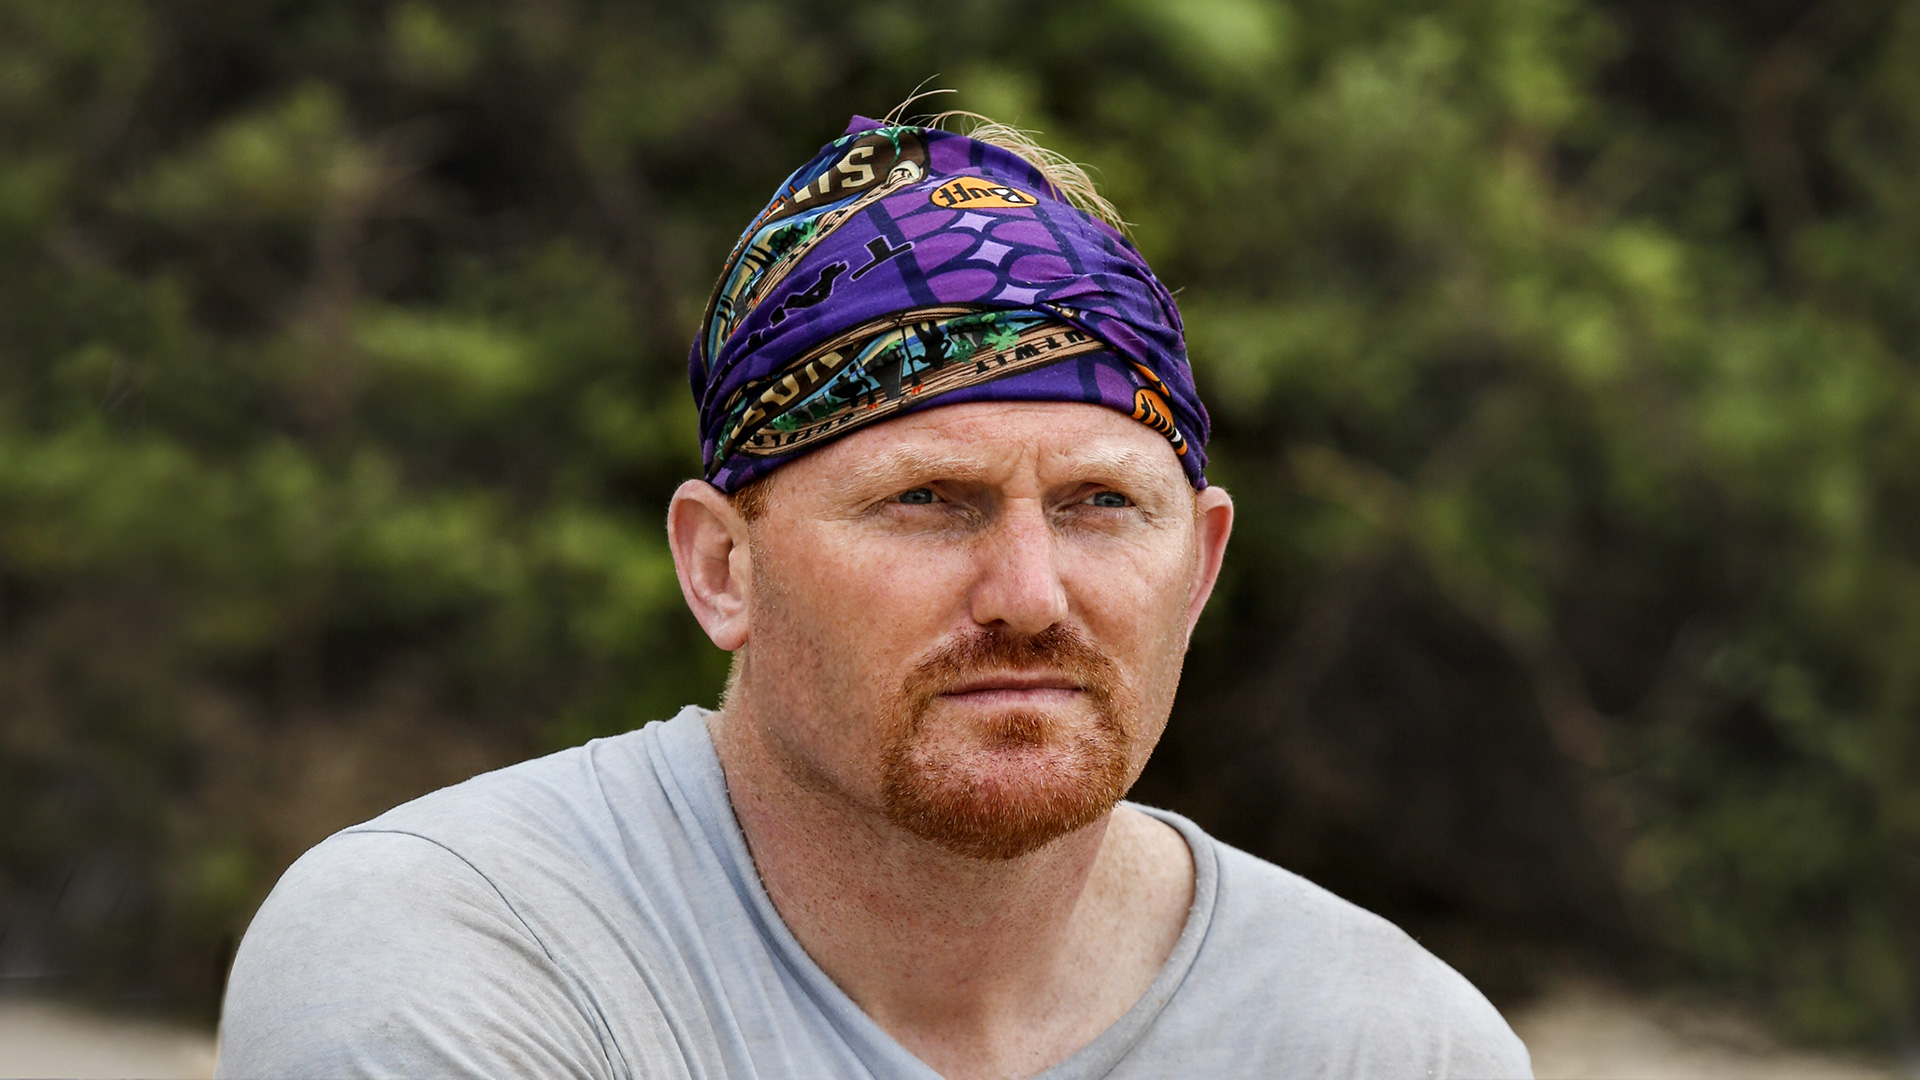 Chris Hammons on Tribe Takali (Gen X)